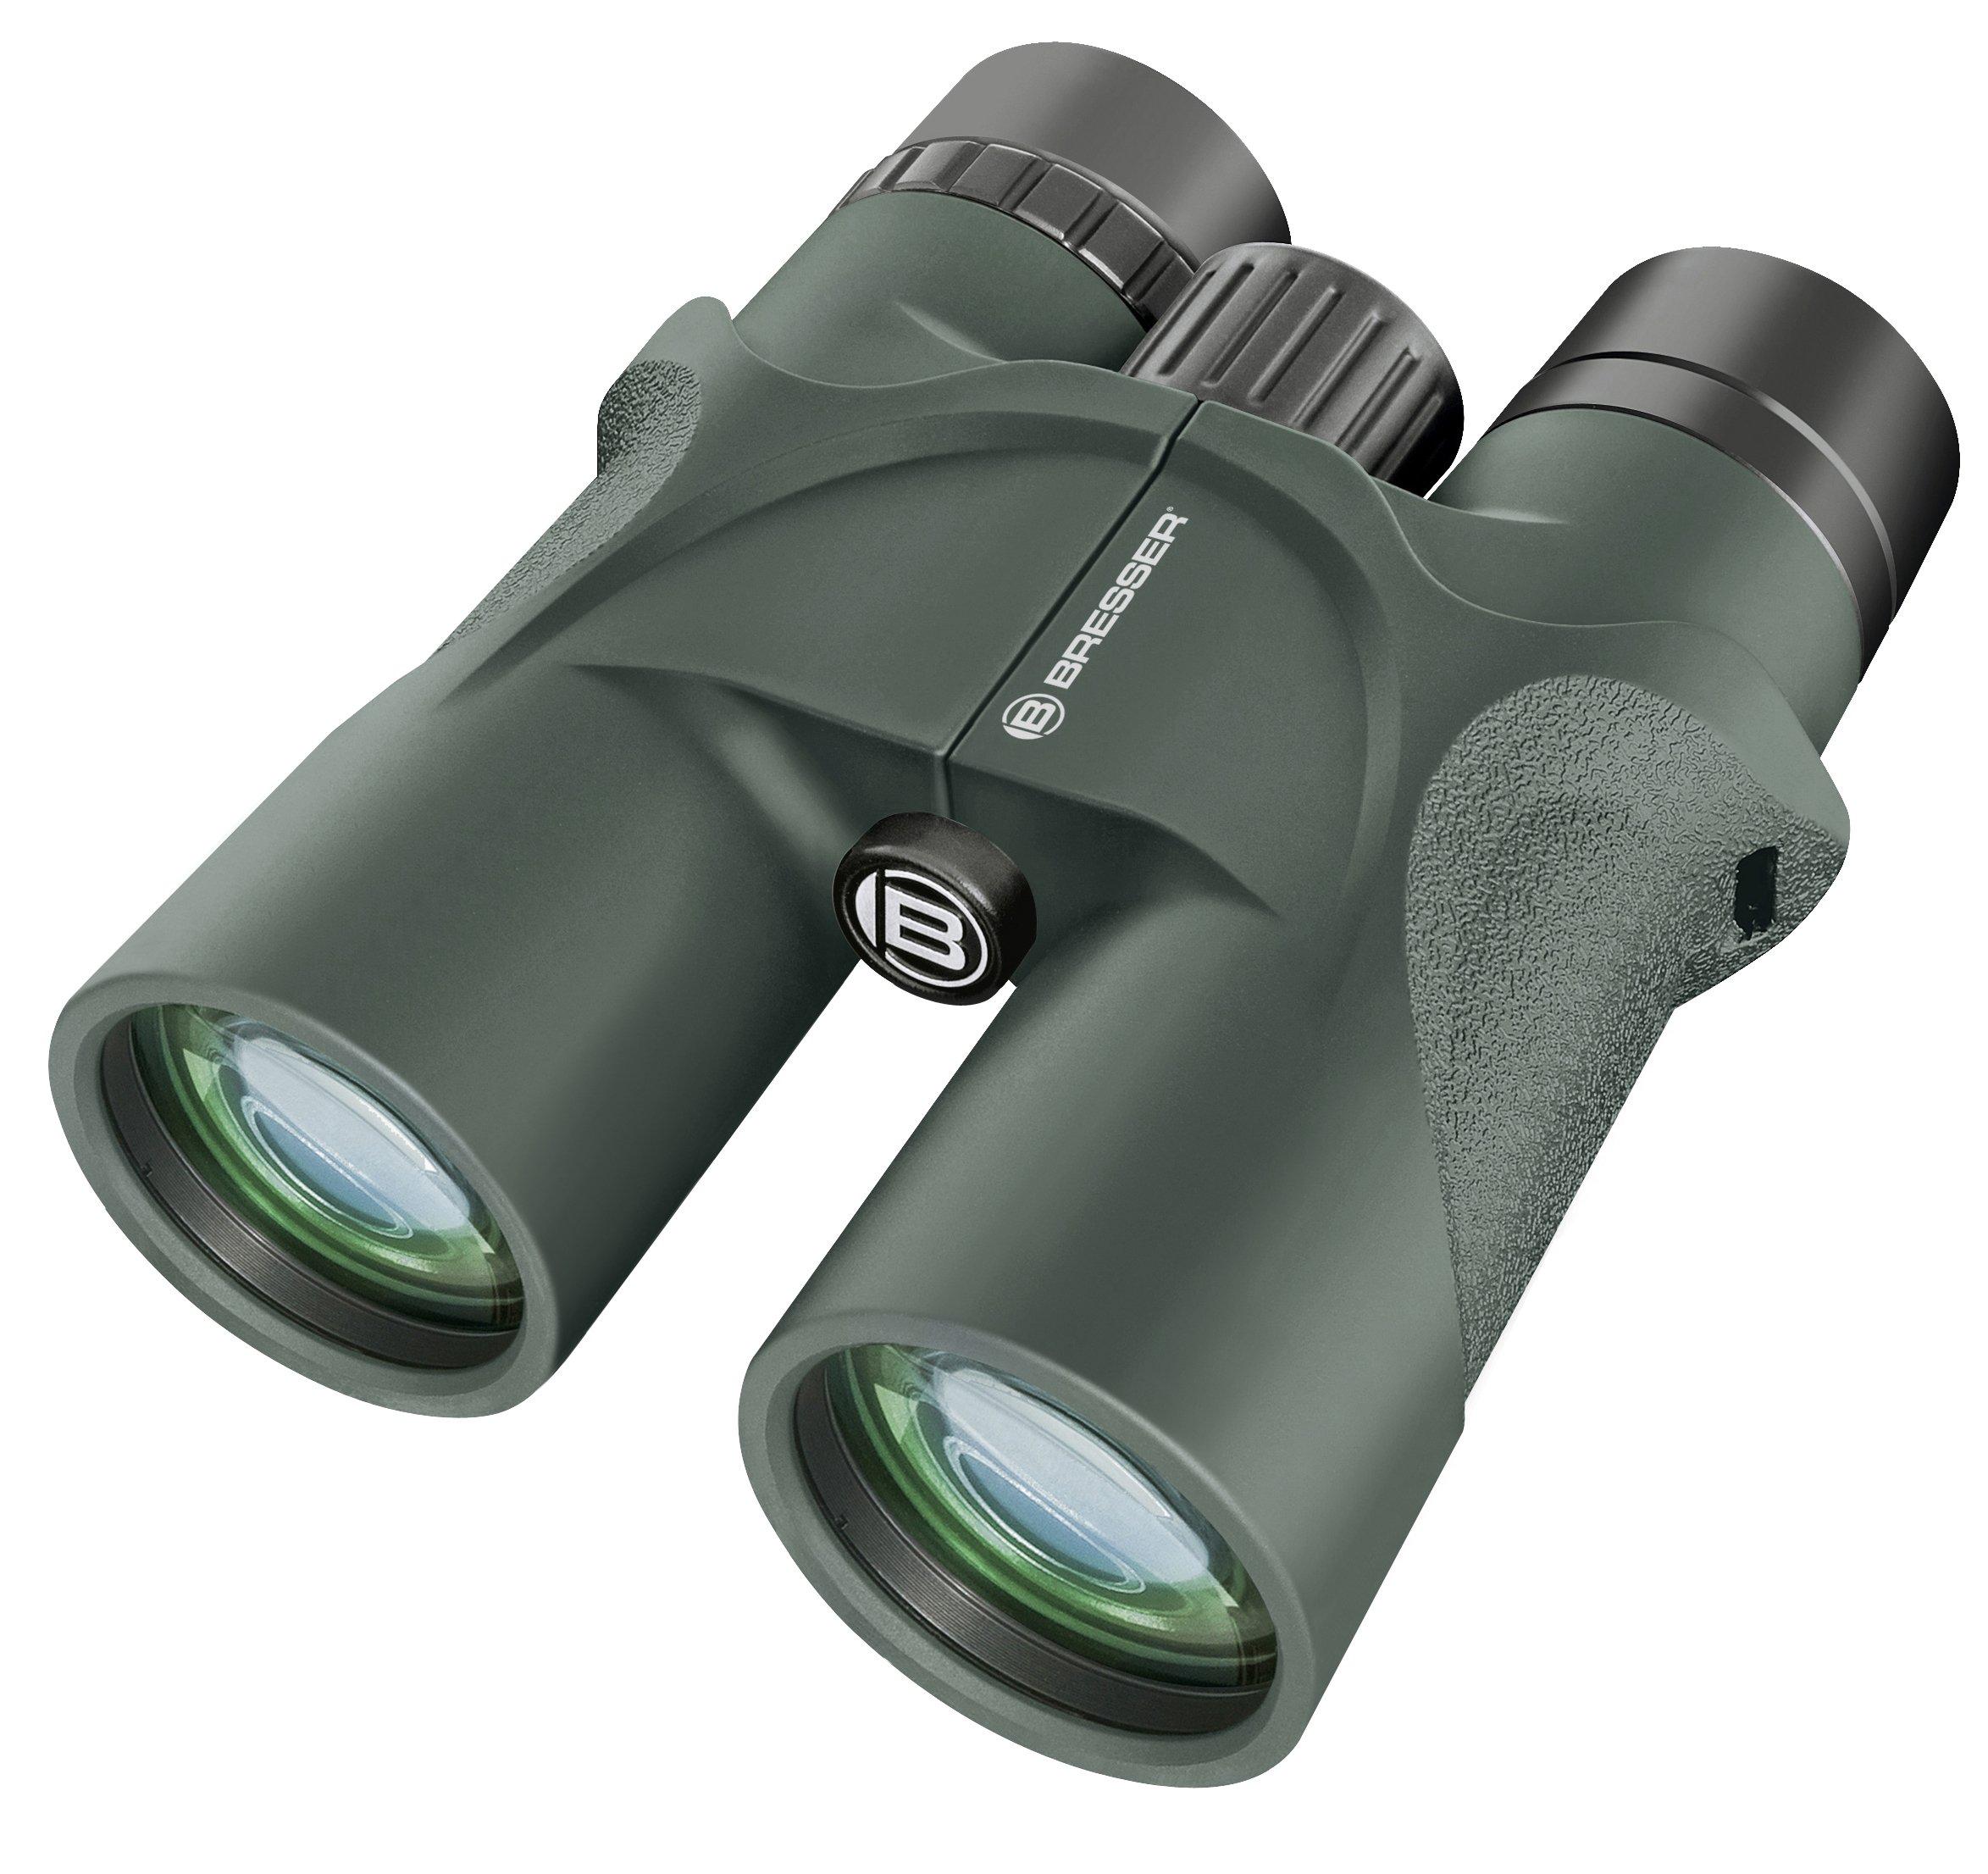 BRESSER Condor Binocular, 8X 42mm